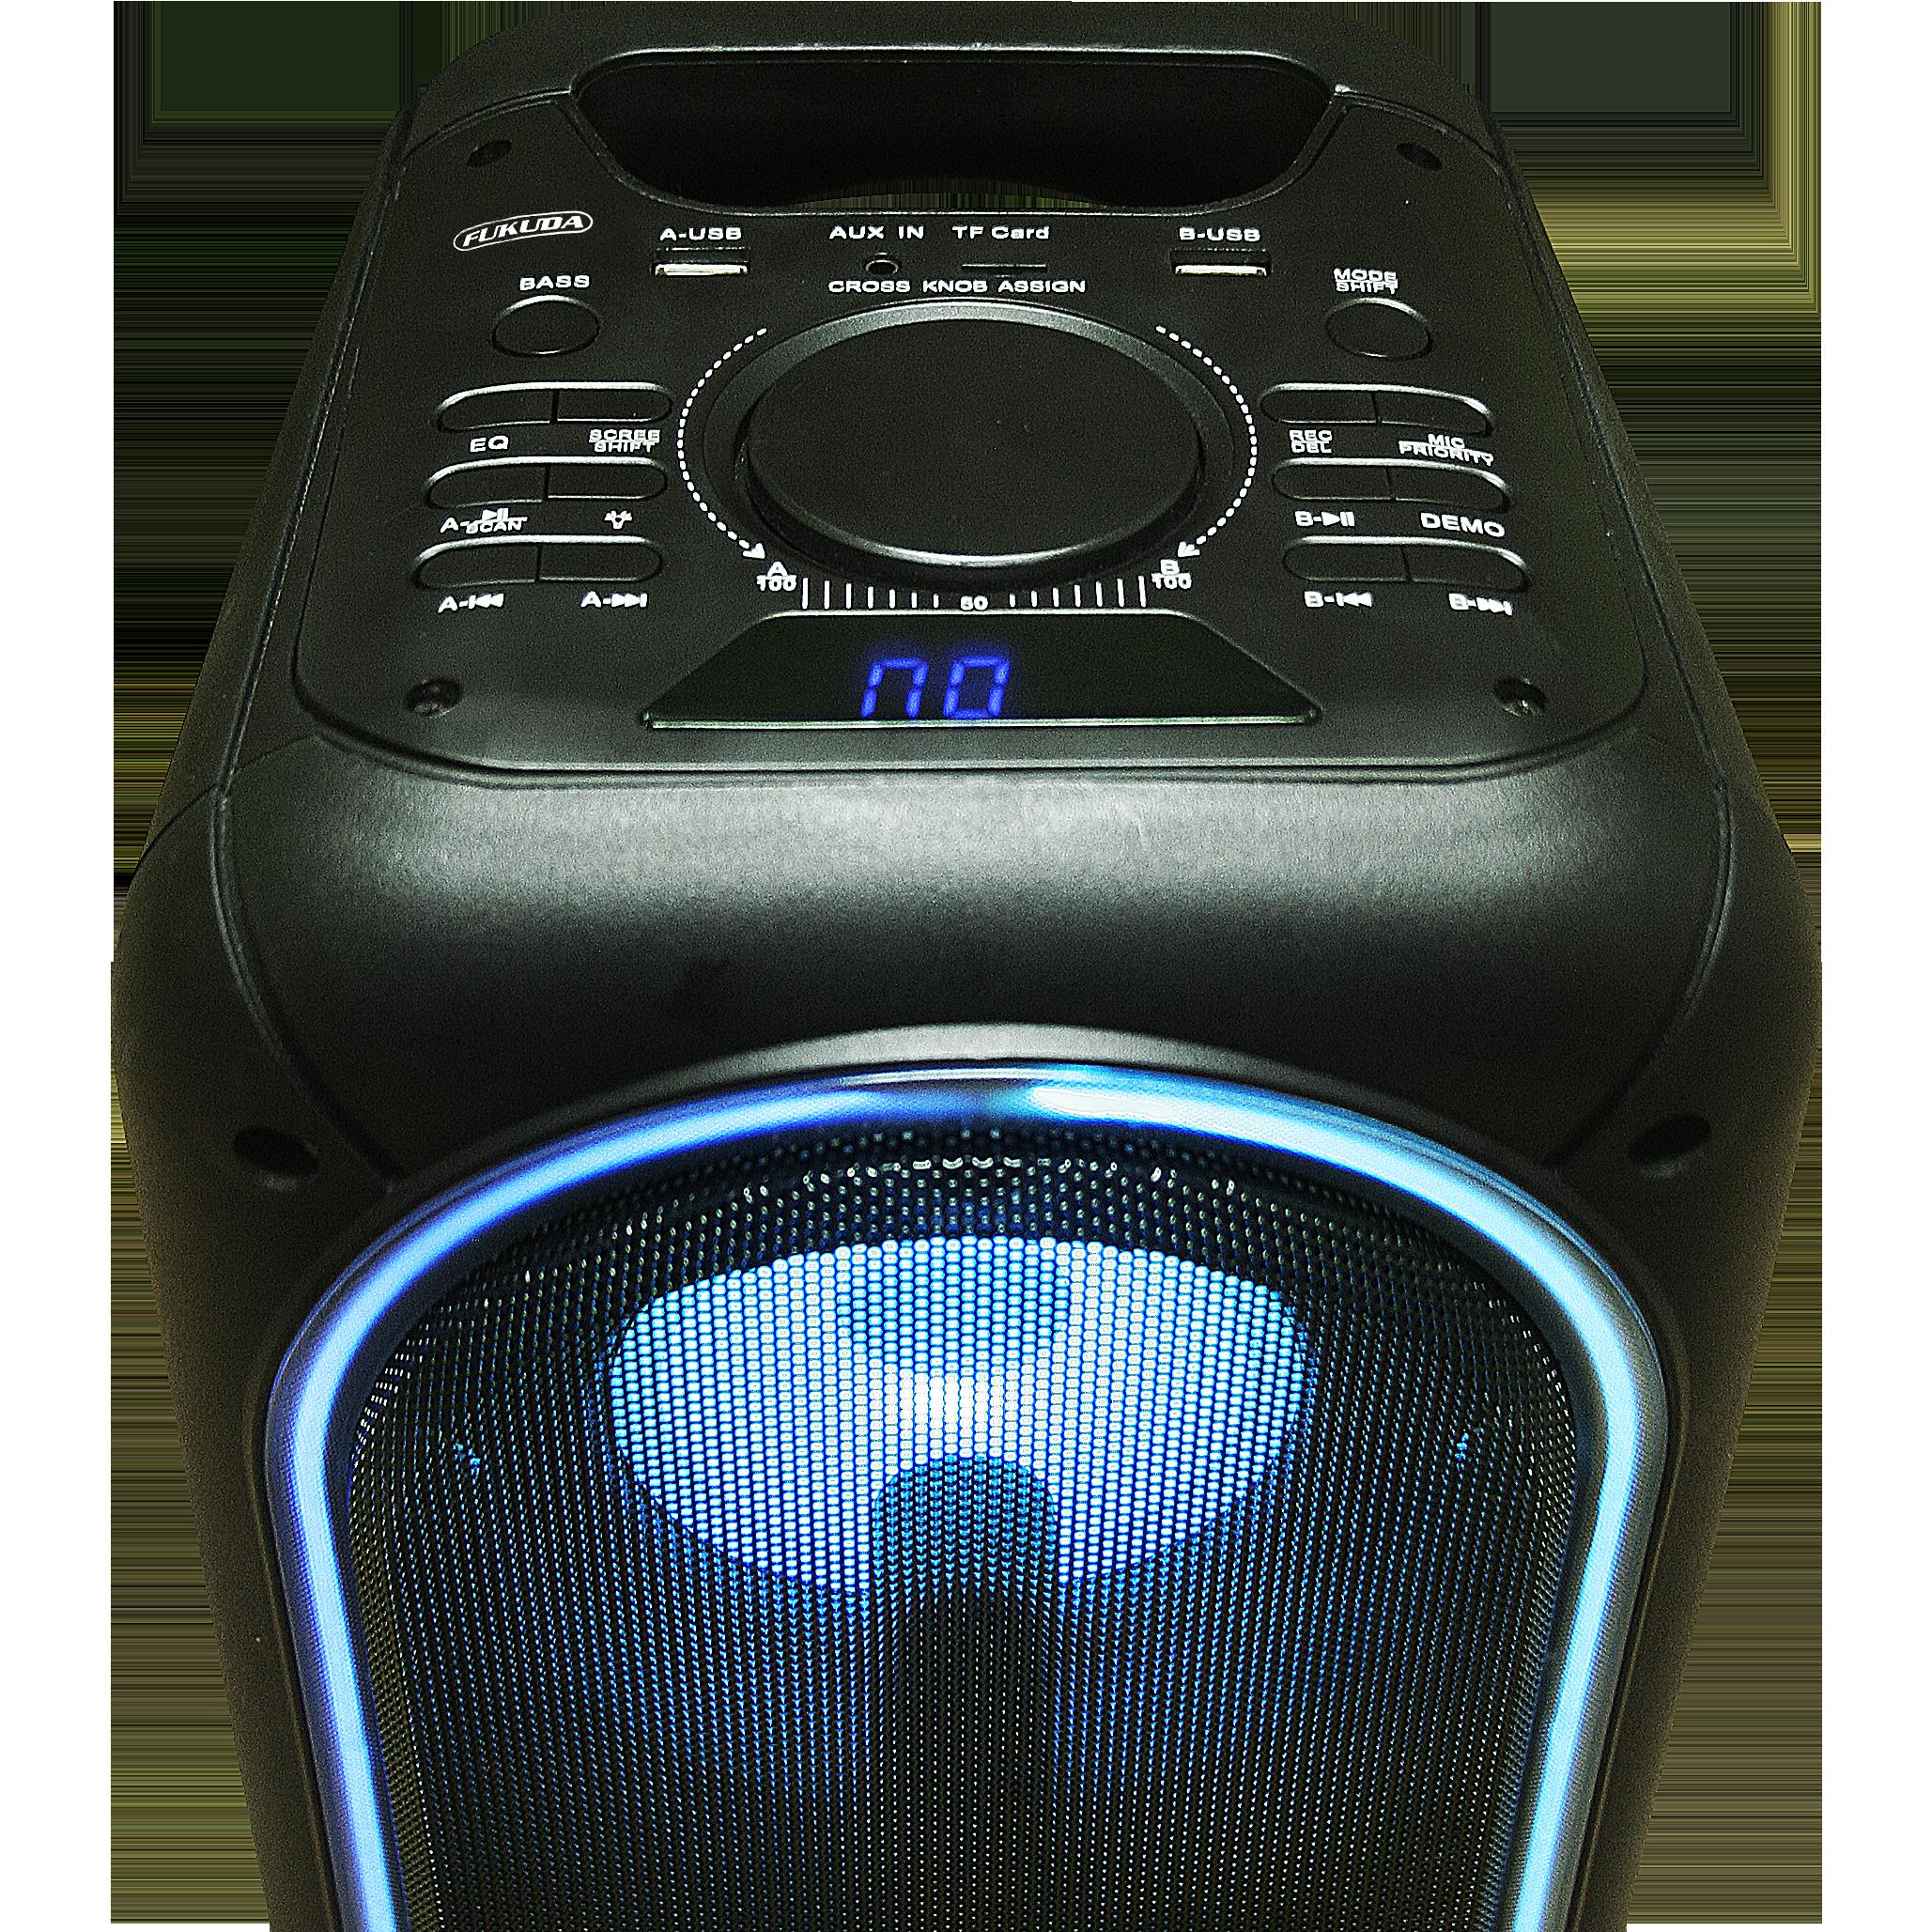 Fukuda FAS920 KARAboxJAMM Karaoke/Party Speaker 15Wx2+5Wx2 RMS